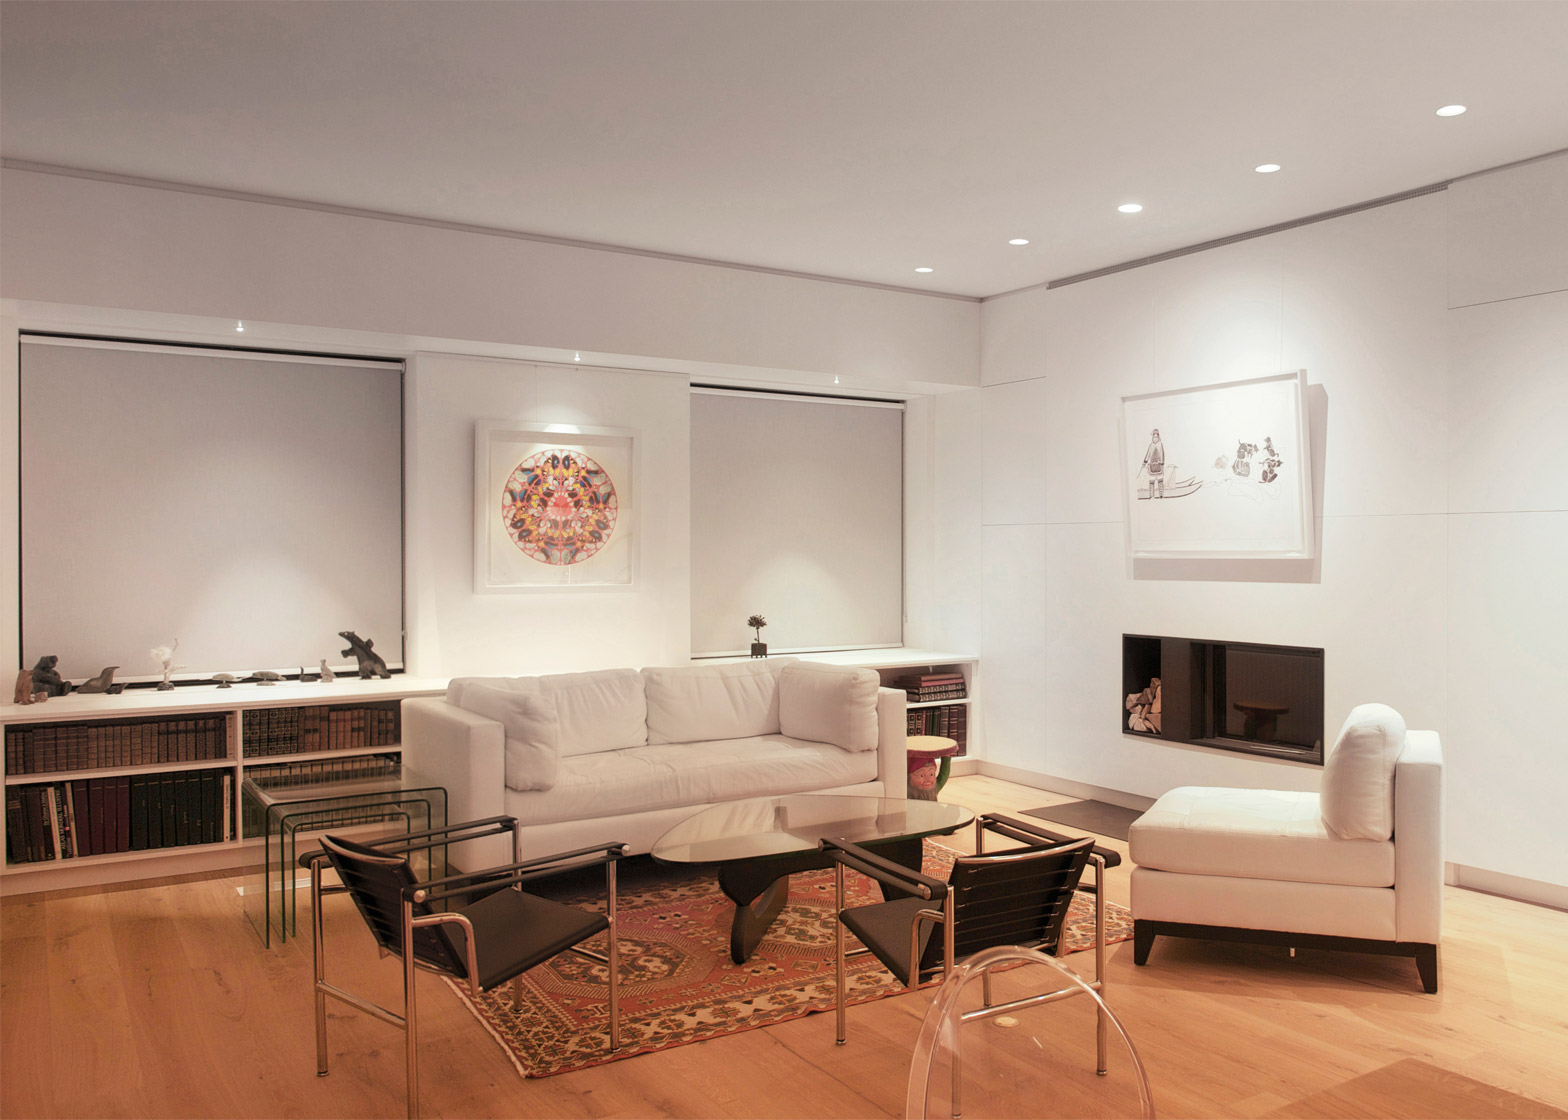 K House by Nicolas Koff